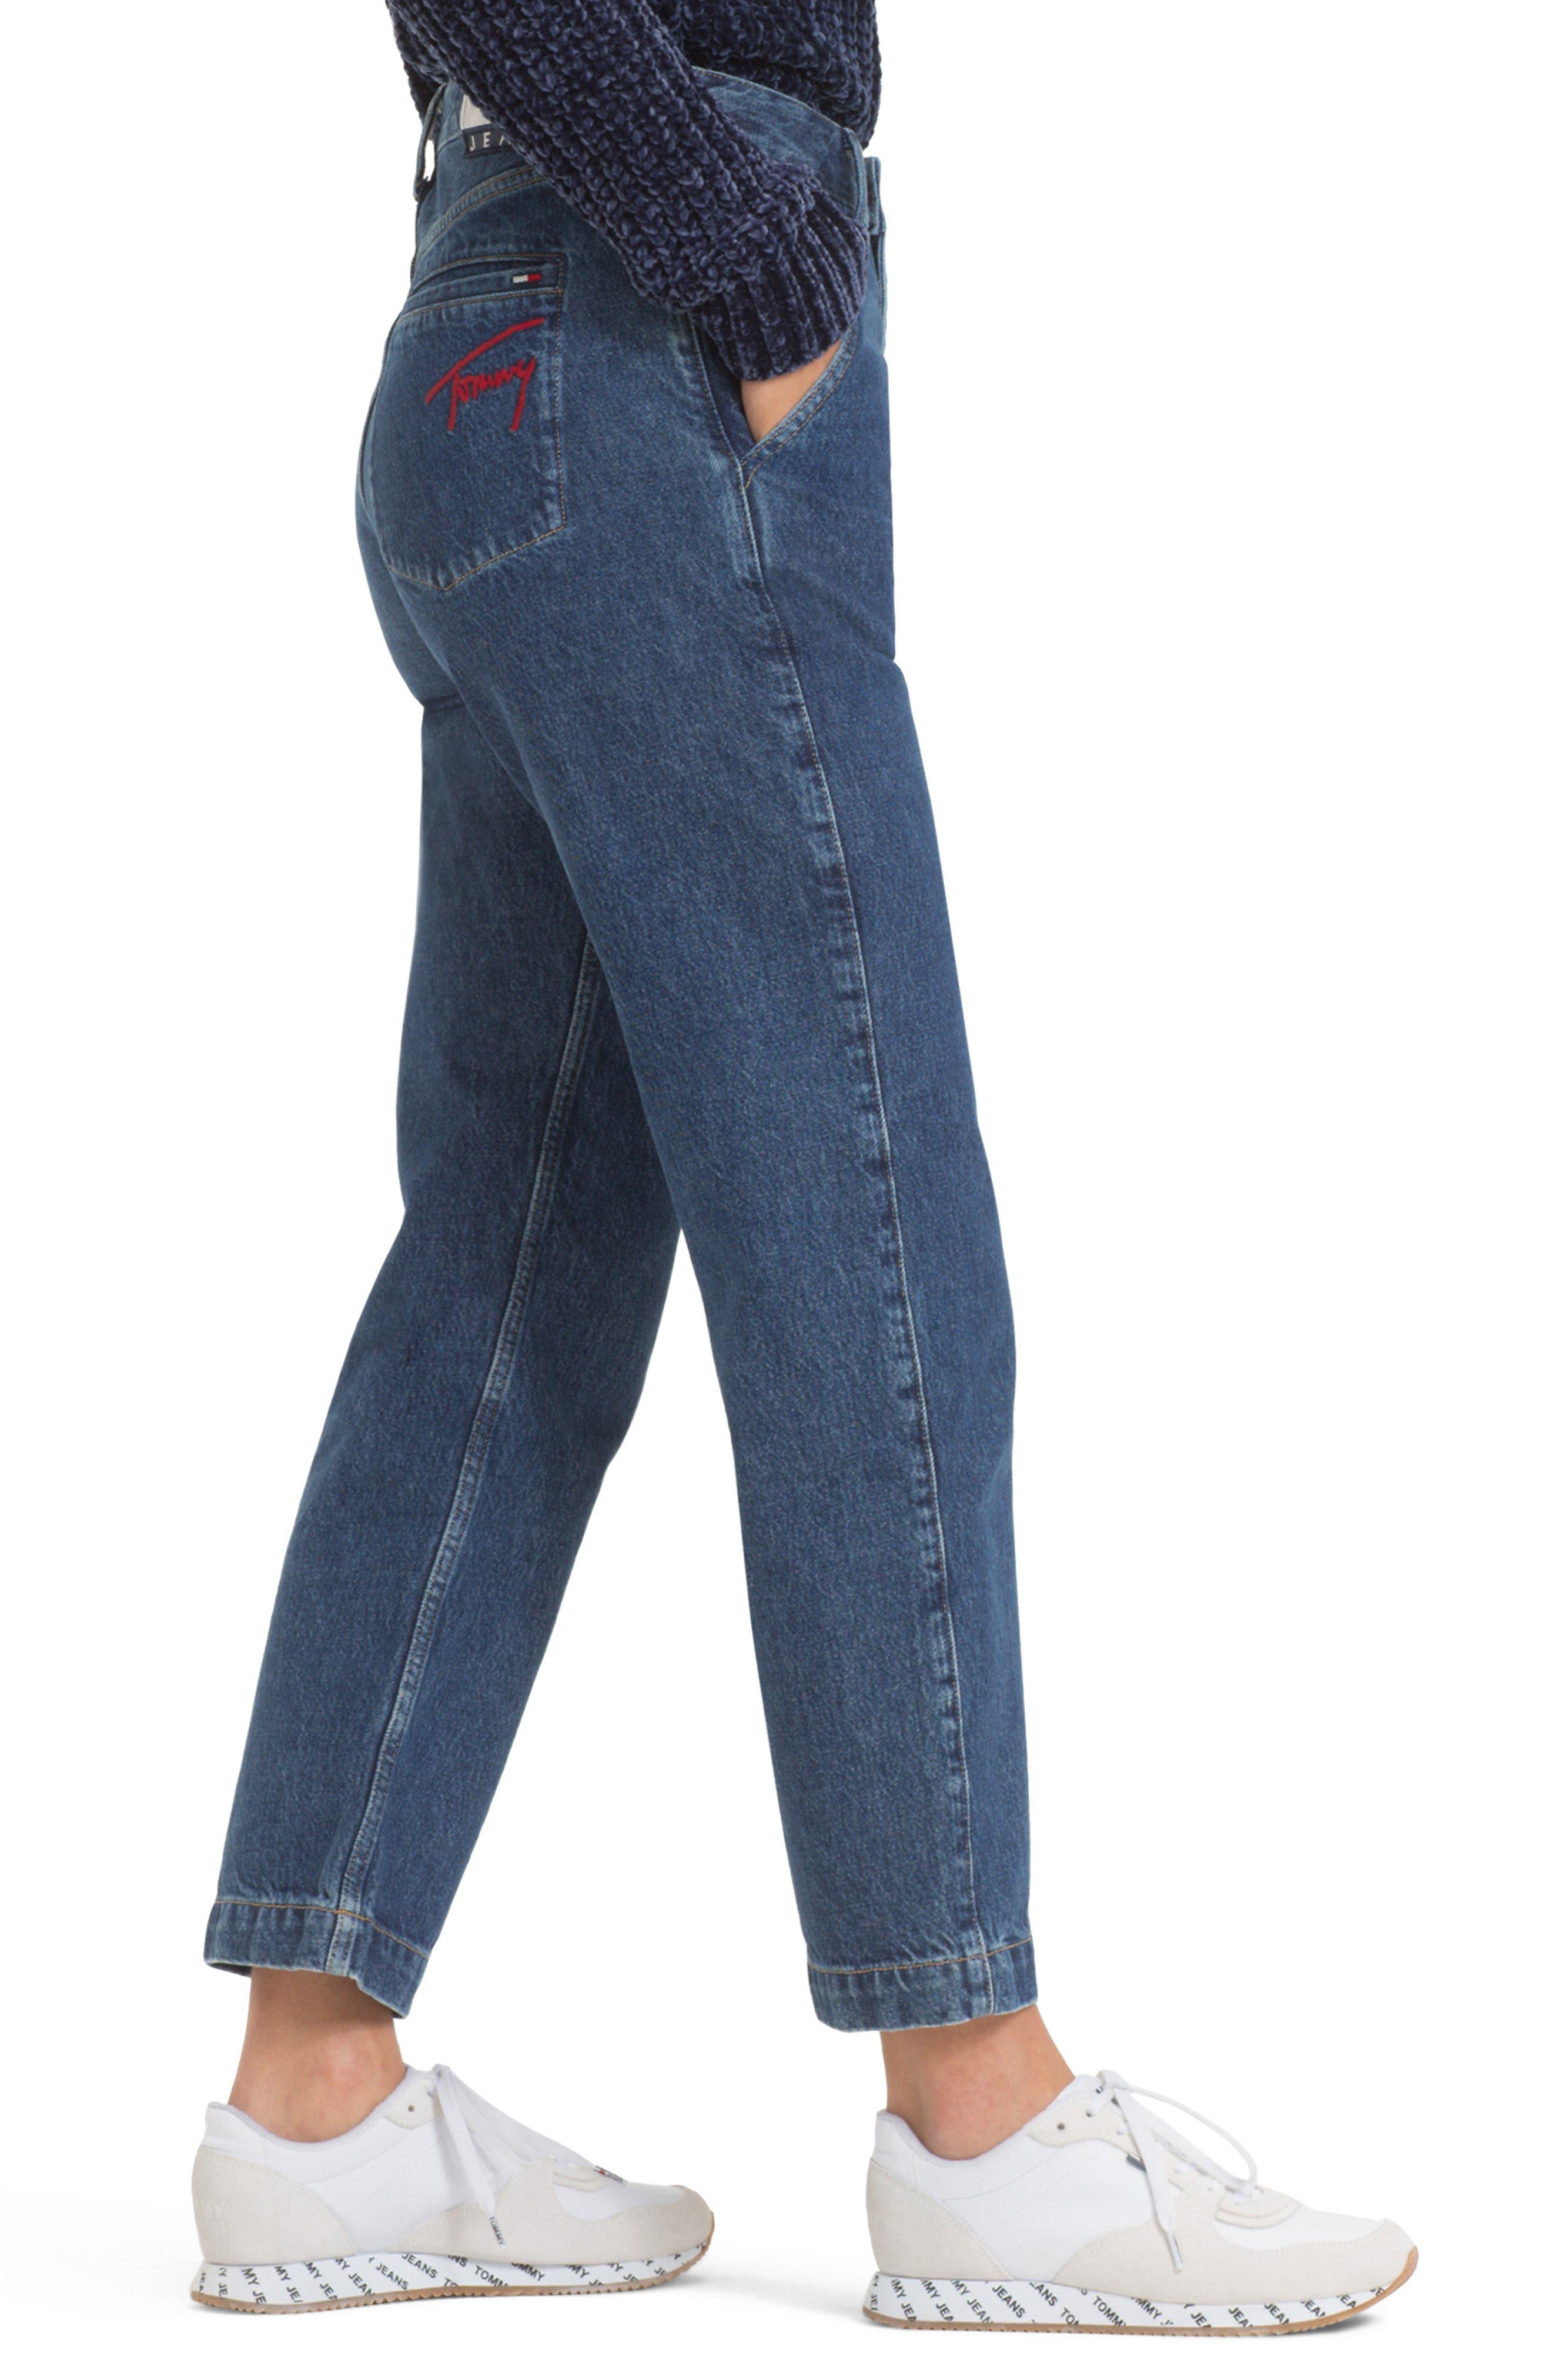 TJW Straight Leg Jeans,                             Alternate thumbnail 3, color,                             GOUGH MID BLUE RIGID